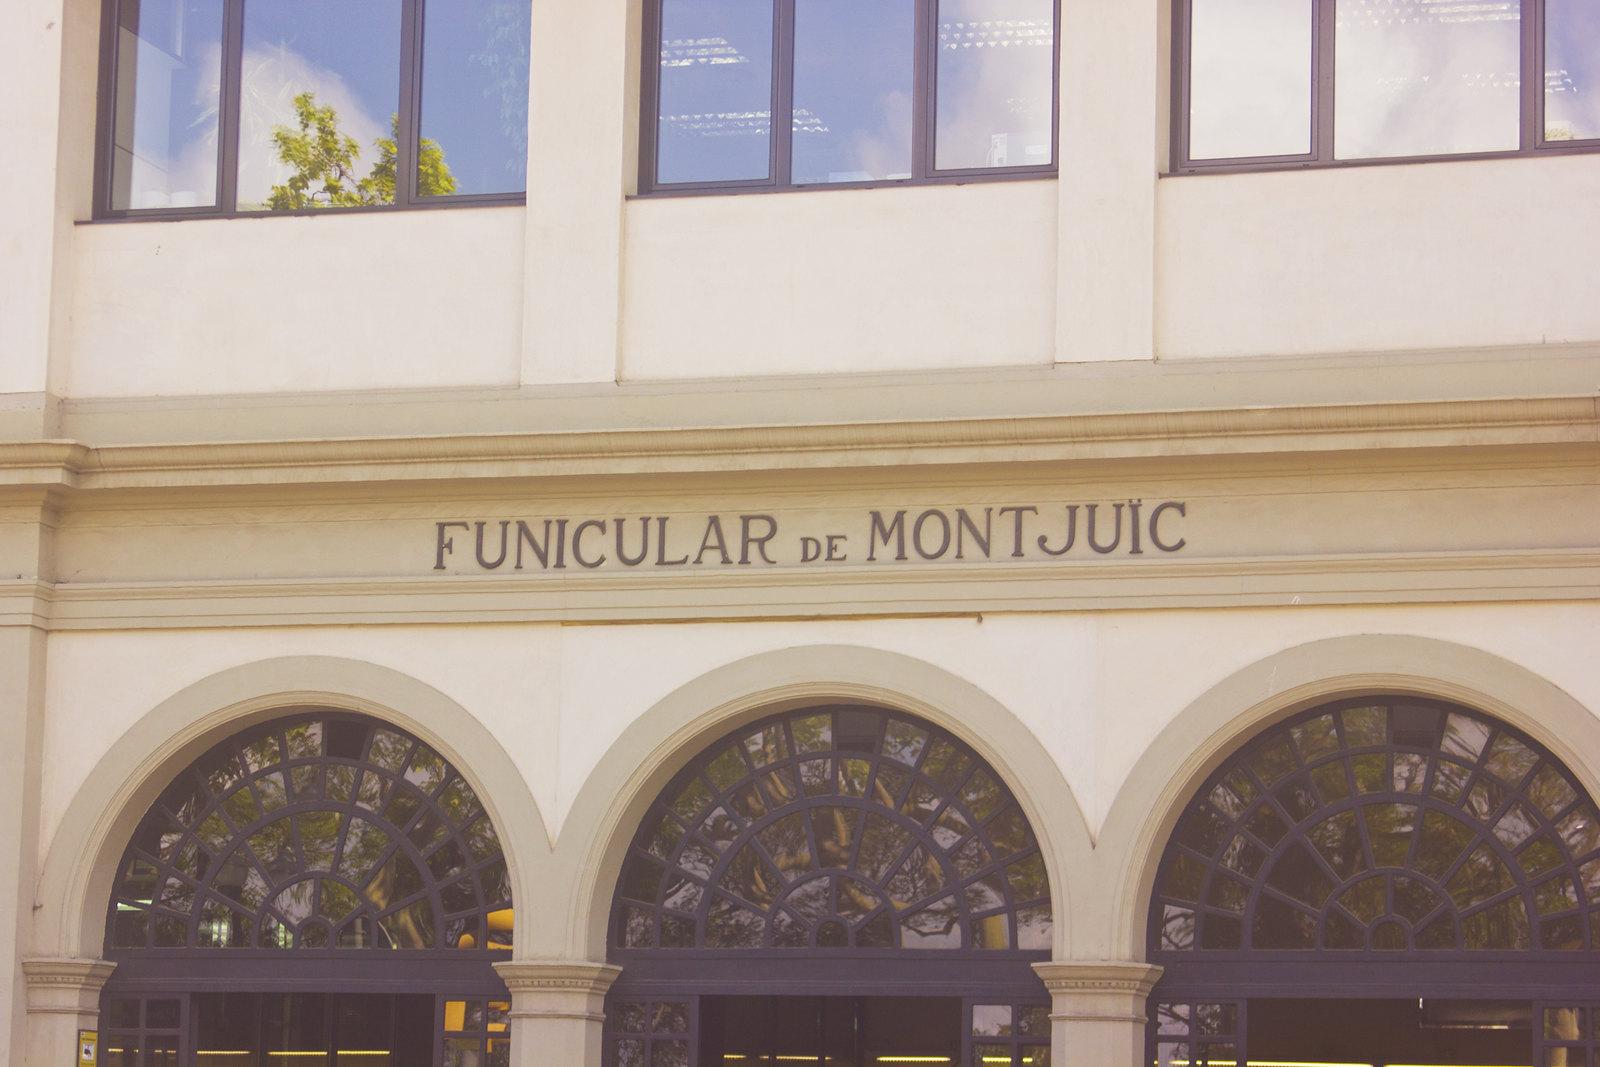 Funicular de Montjuic